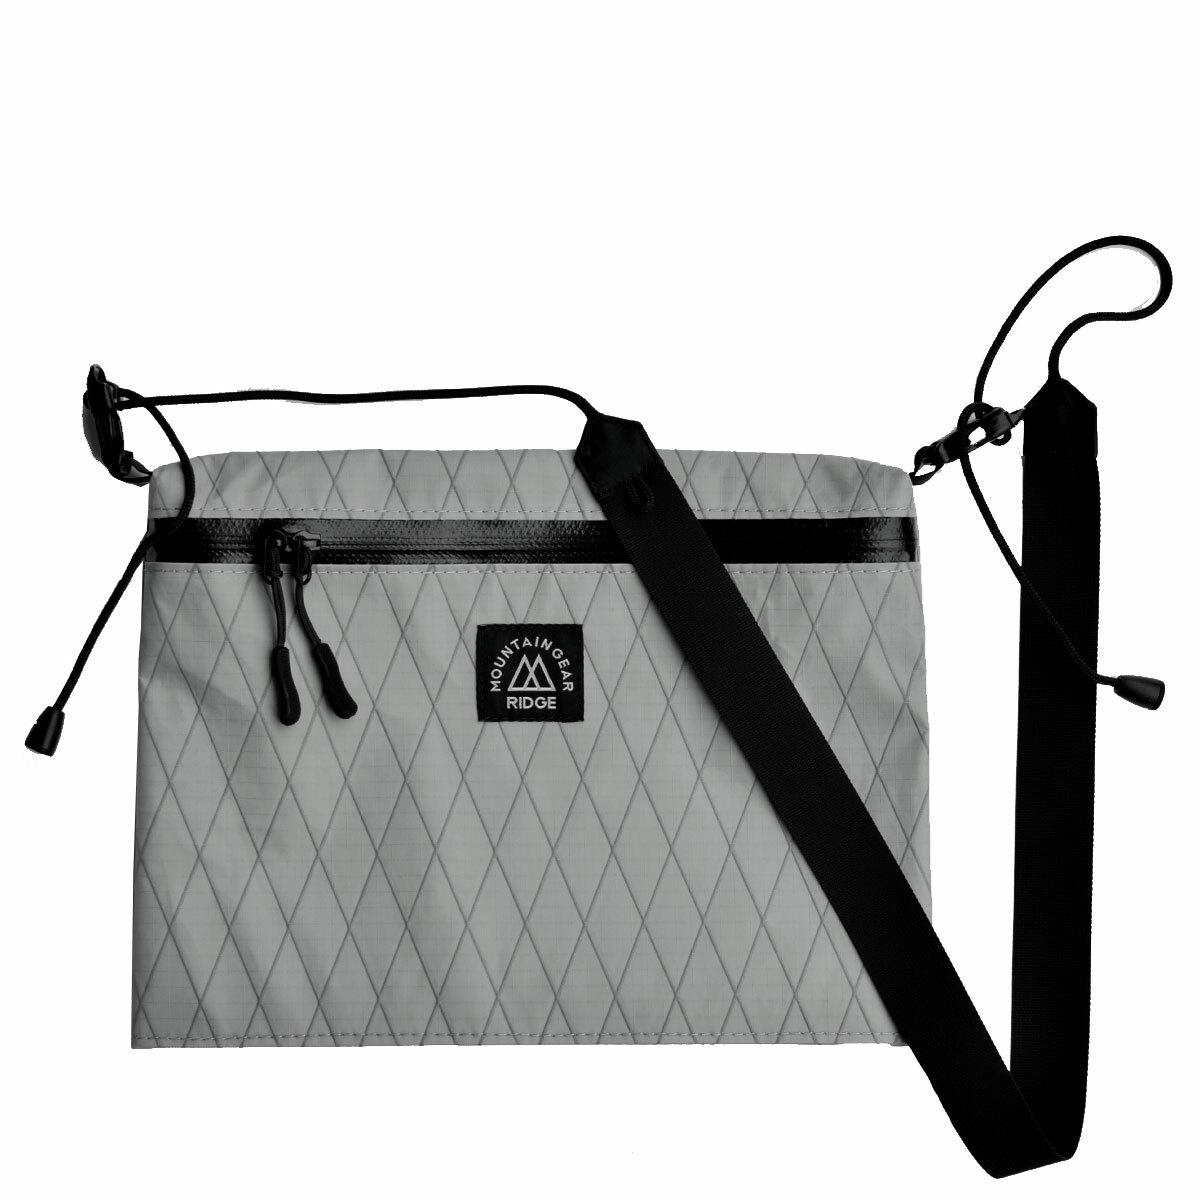 RIDGE MOUNTAIN GEAR(リッジマウンテンギア)Shoulder Pack X-Pac VX07(Grey)